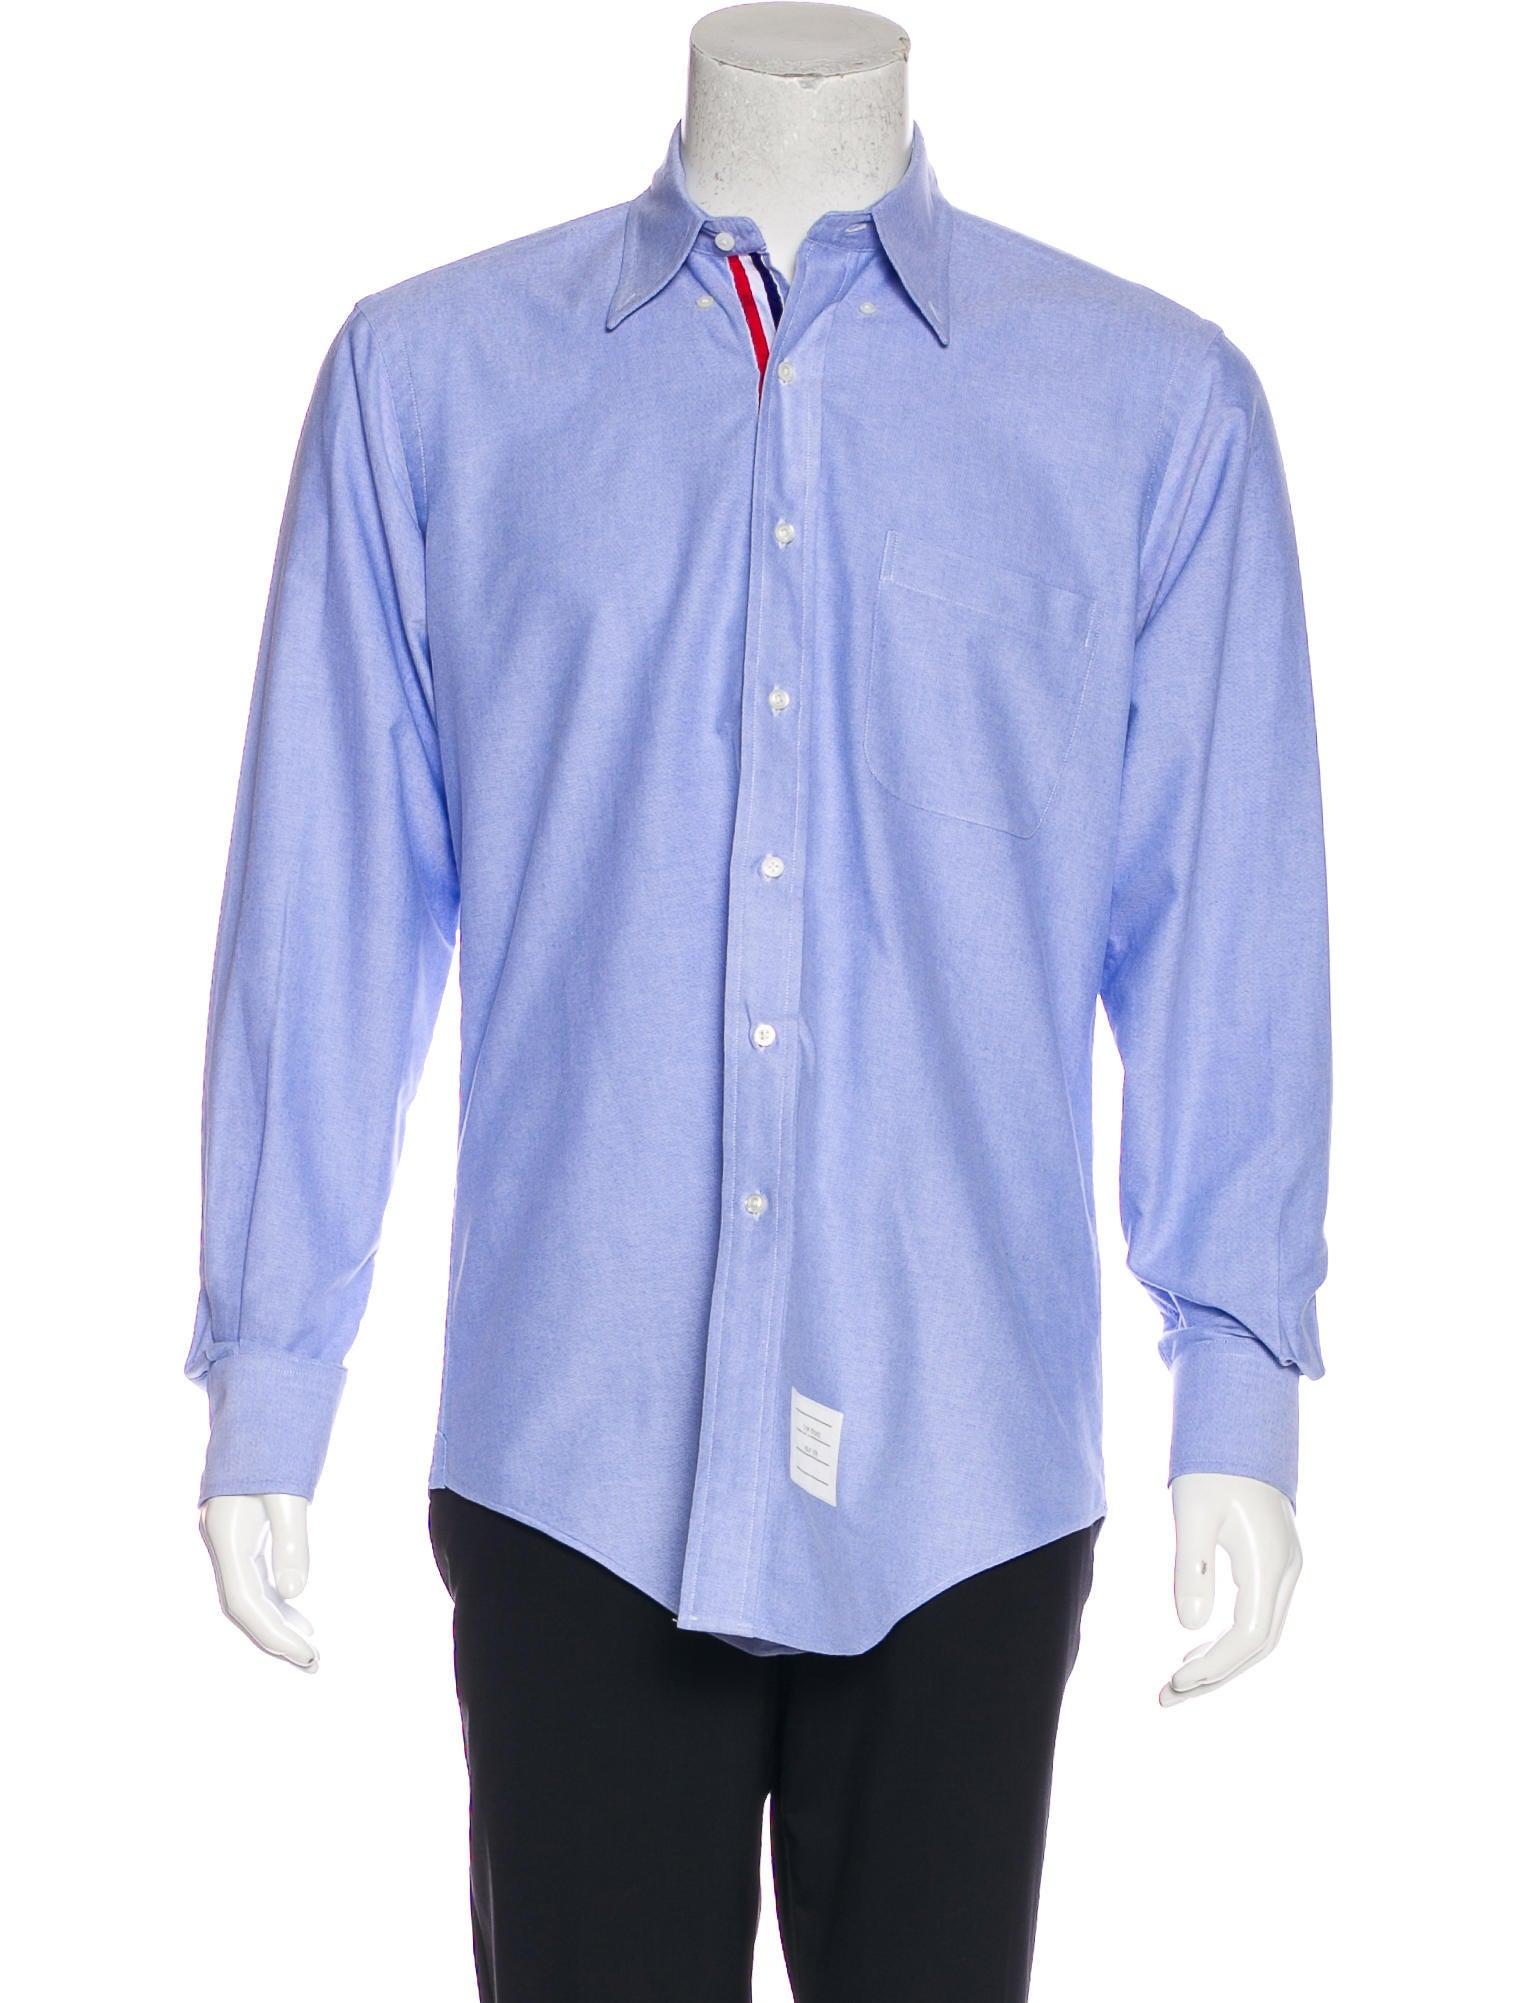 Thom browne classic oxford shirt clothing tho22271 for Thom browne shirt sale